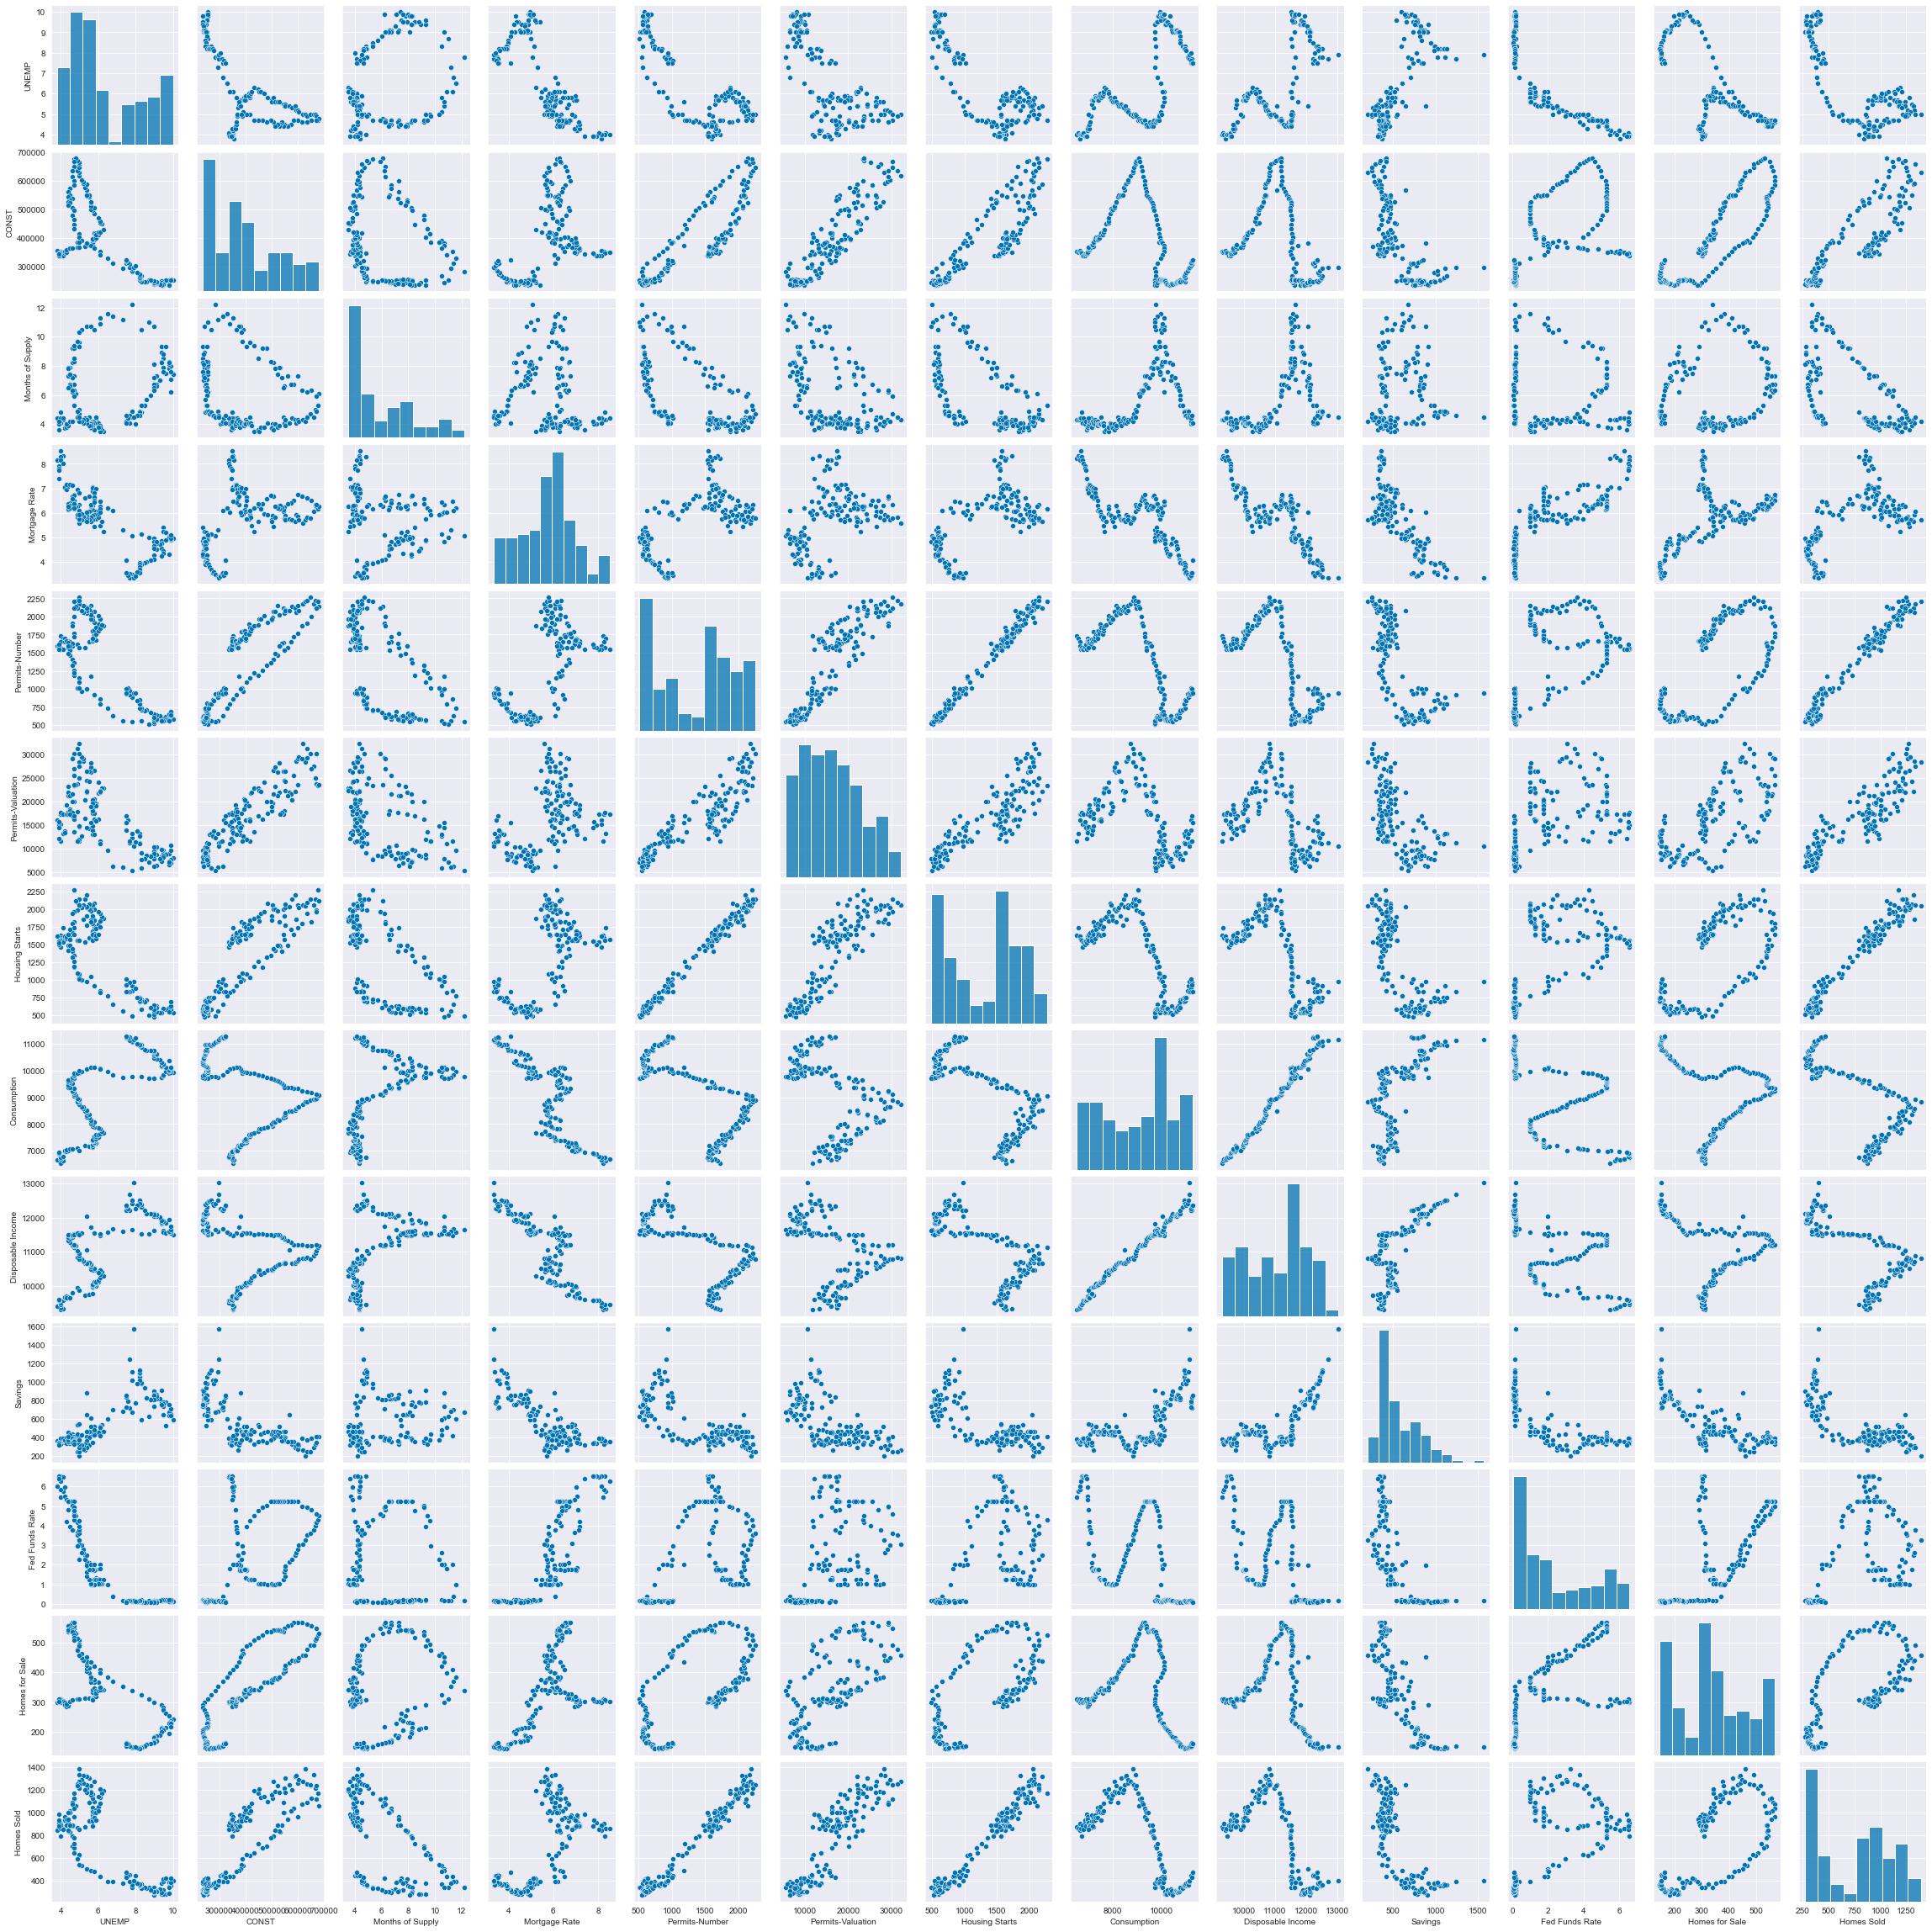 Set A: Pair plots of the variables